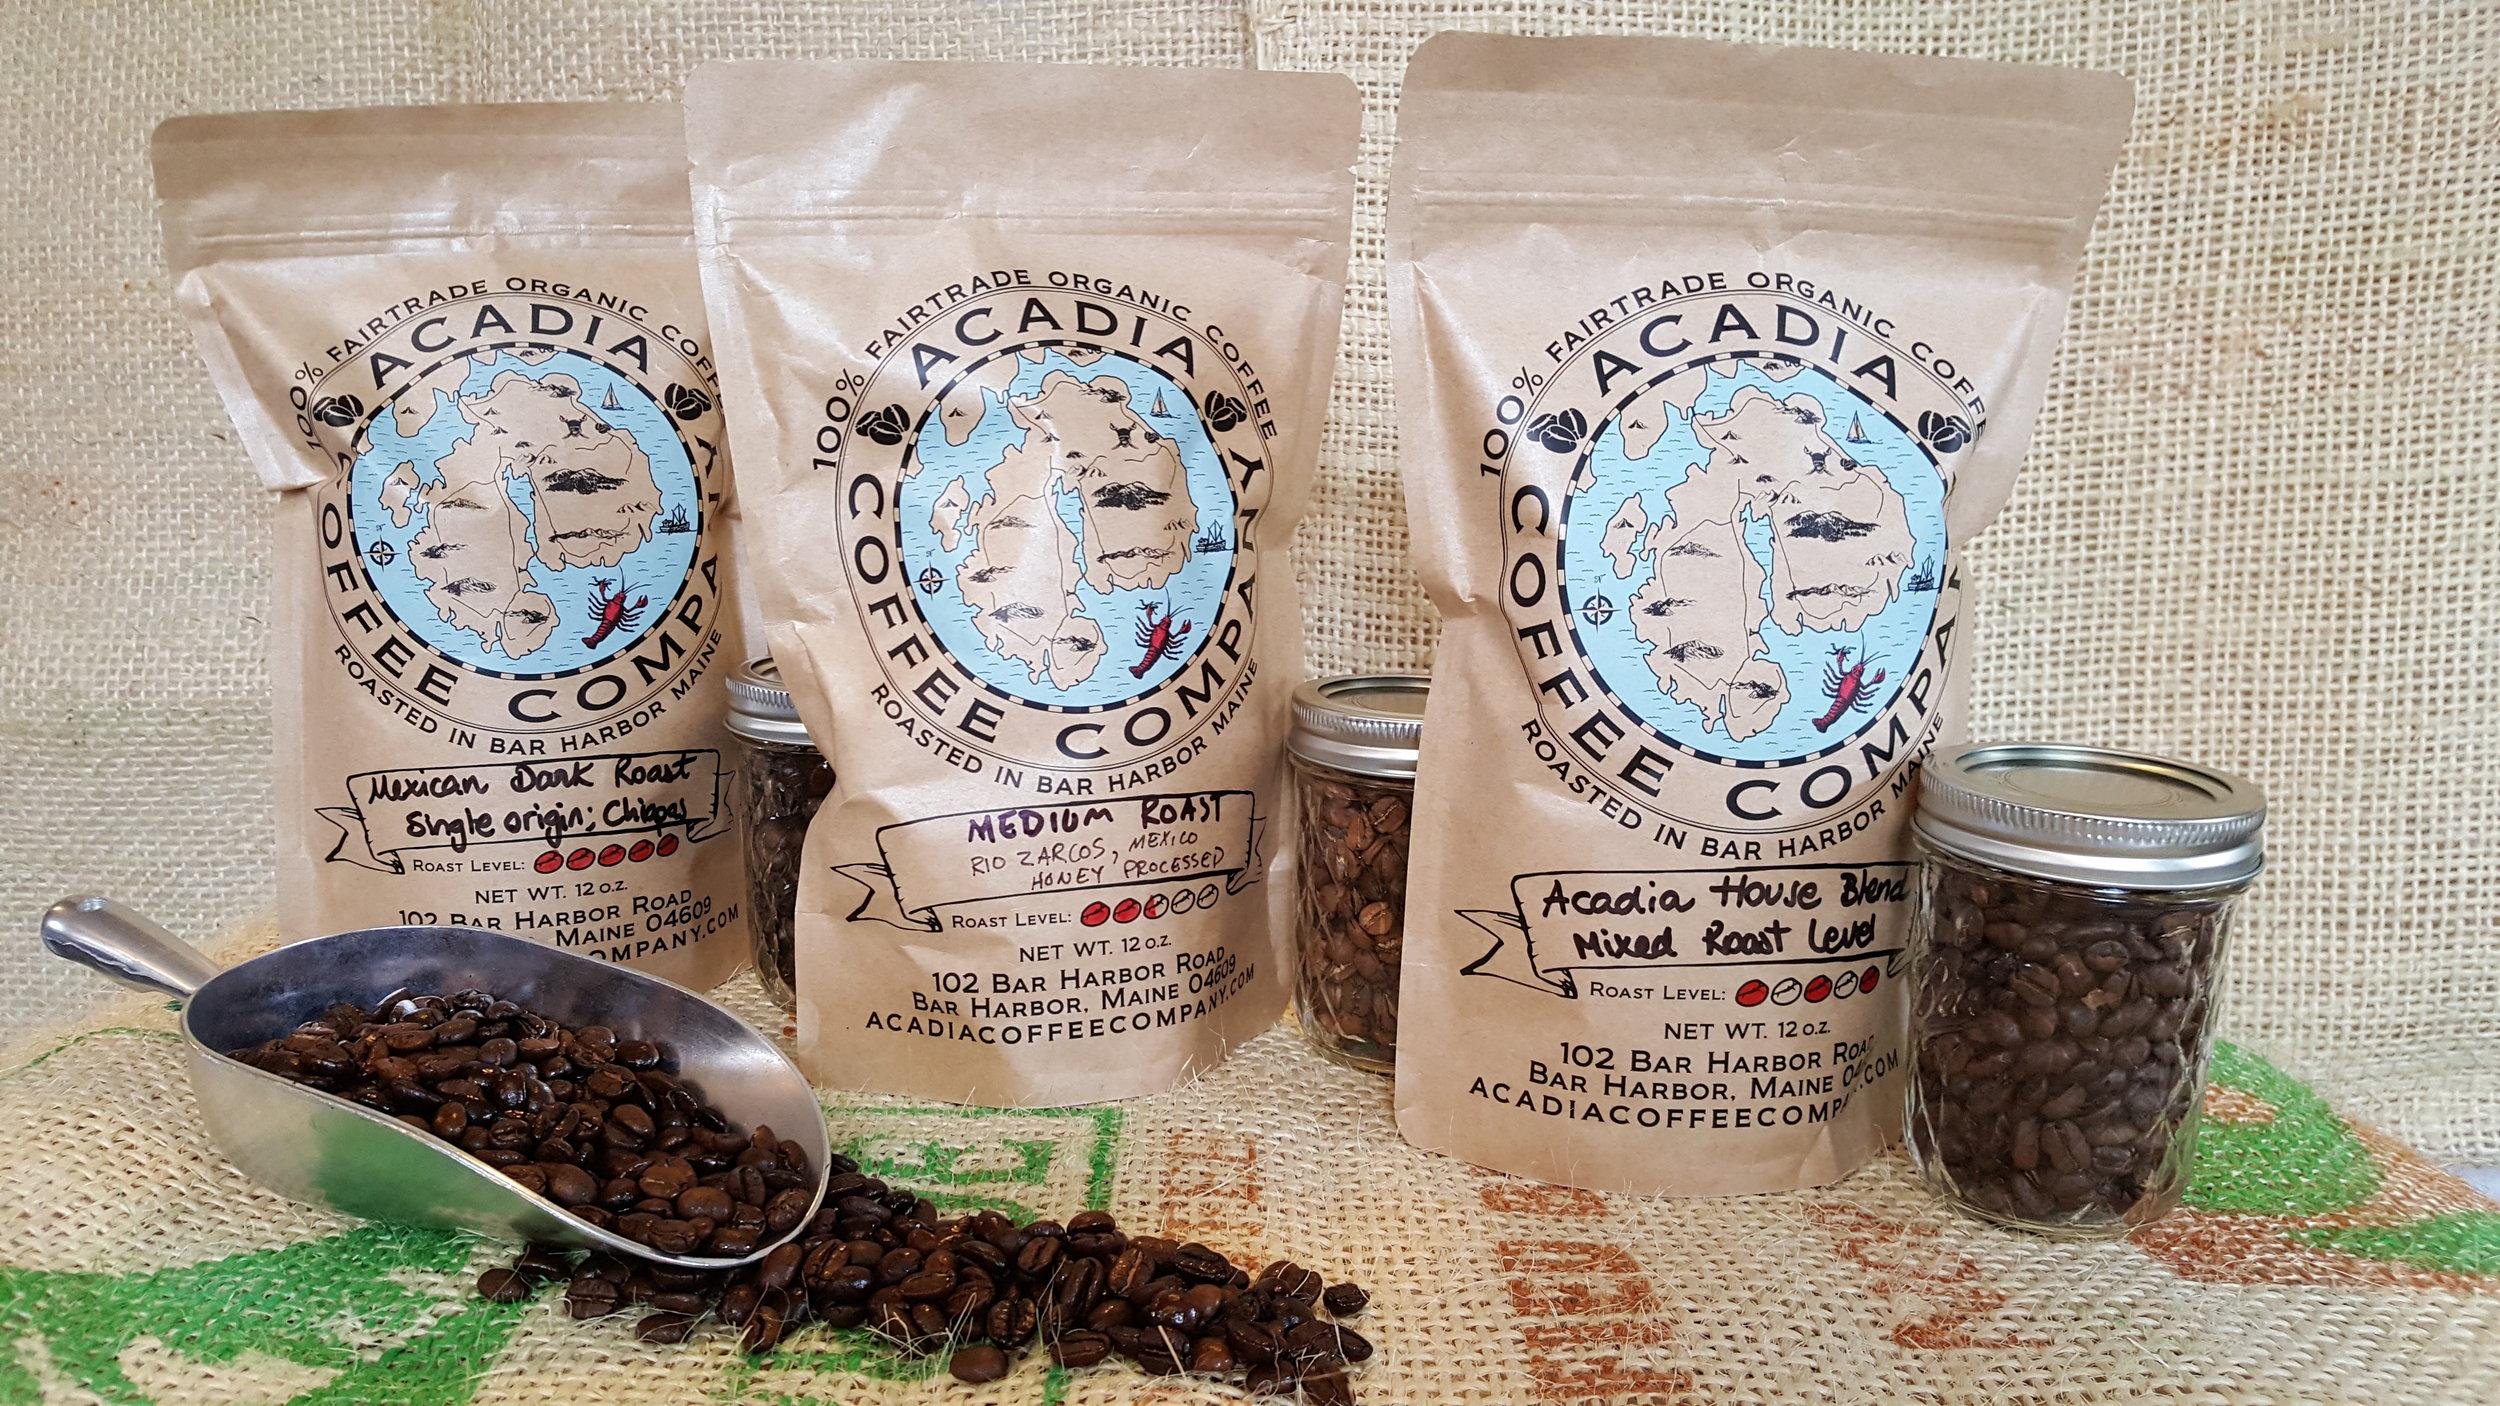 acadia coffee company.jpg